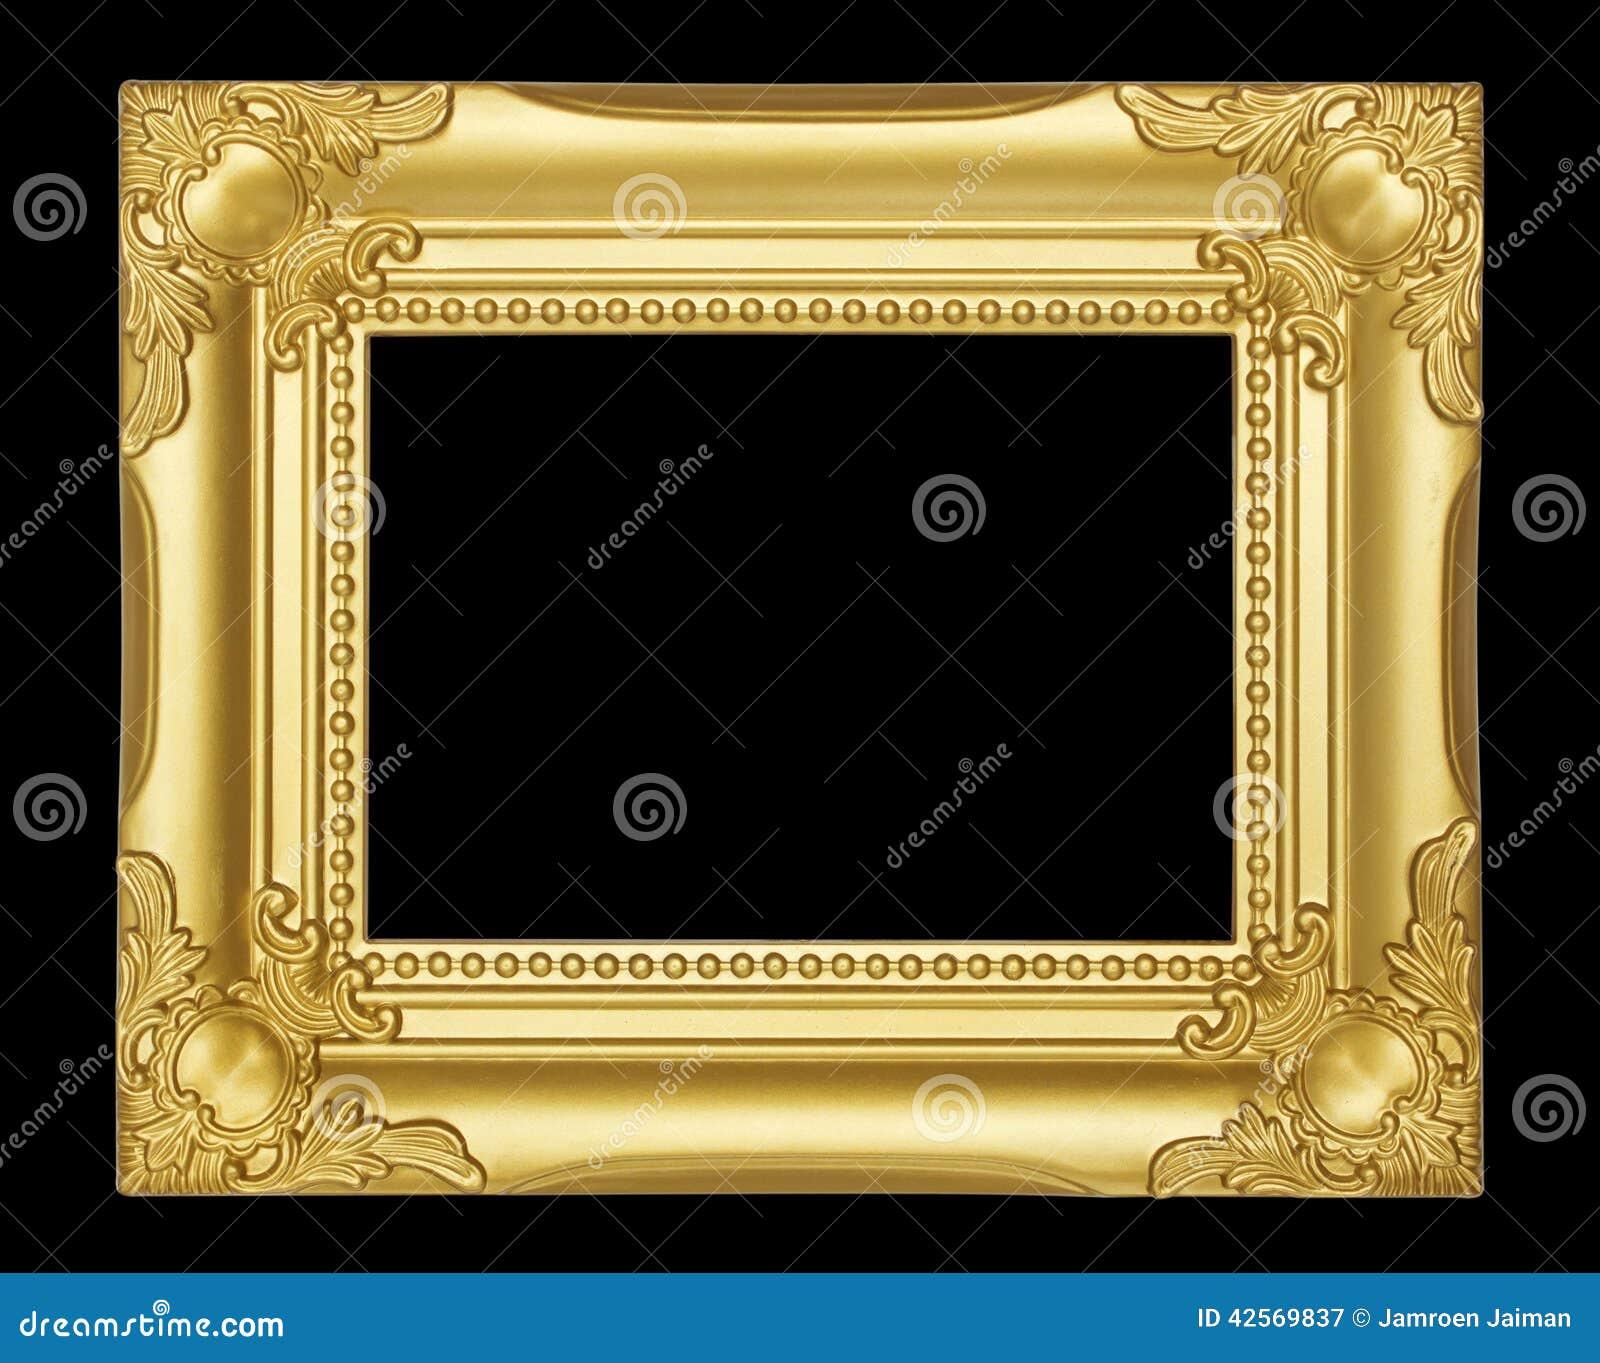 Gold Frame Isolated On Black Background Stock Image